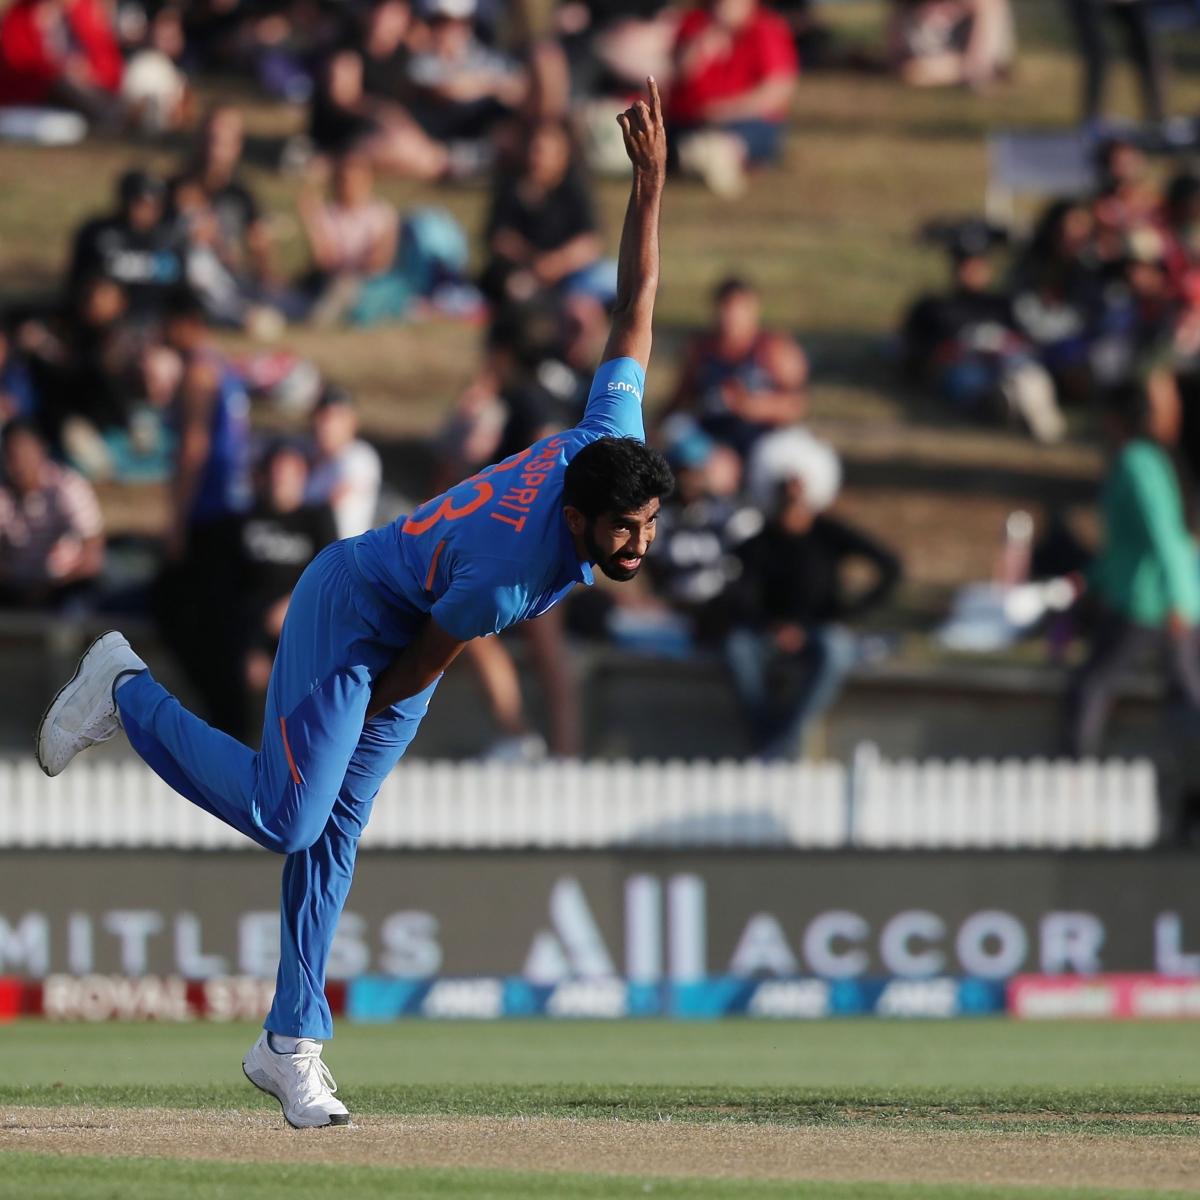 Has Jasprit Bumrah been decoded by batsmen?